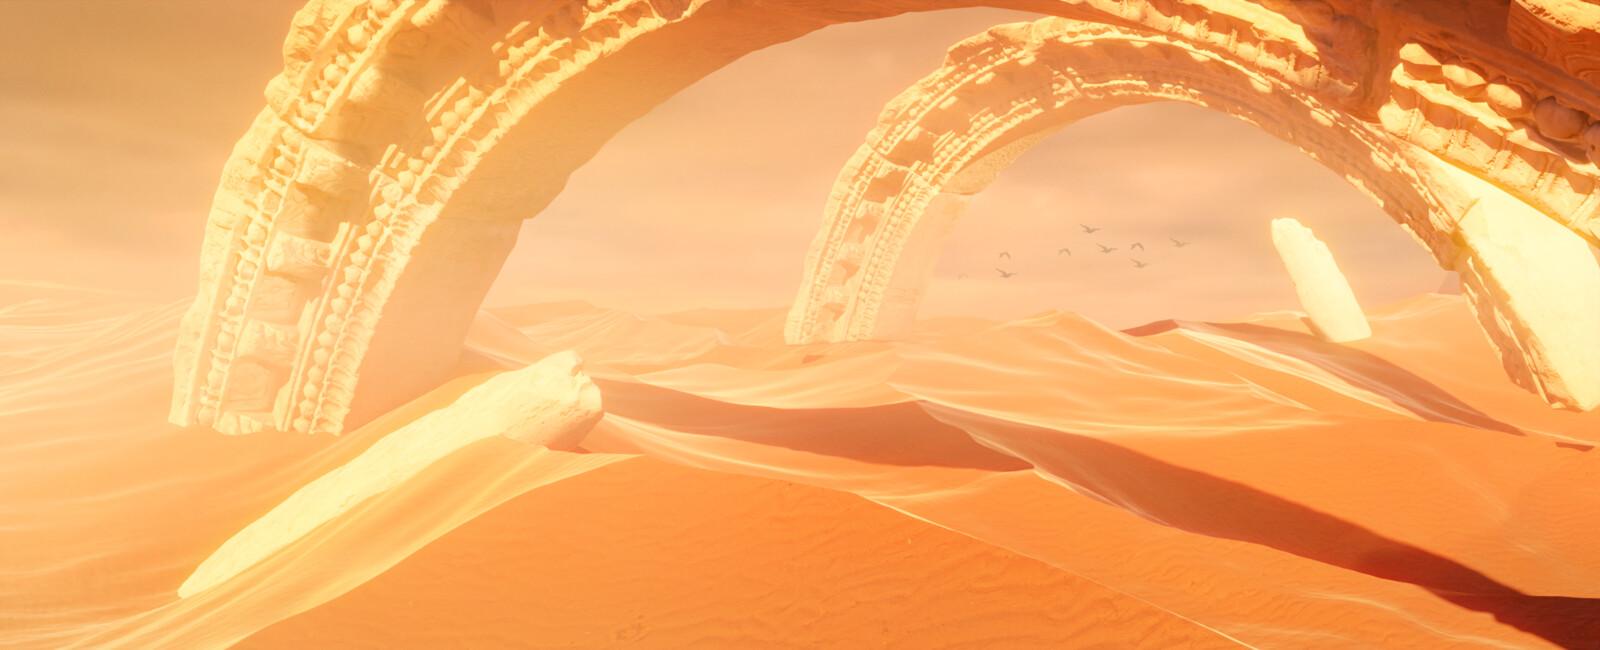 Desert dunes ruins environment midday lighting